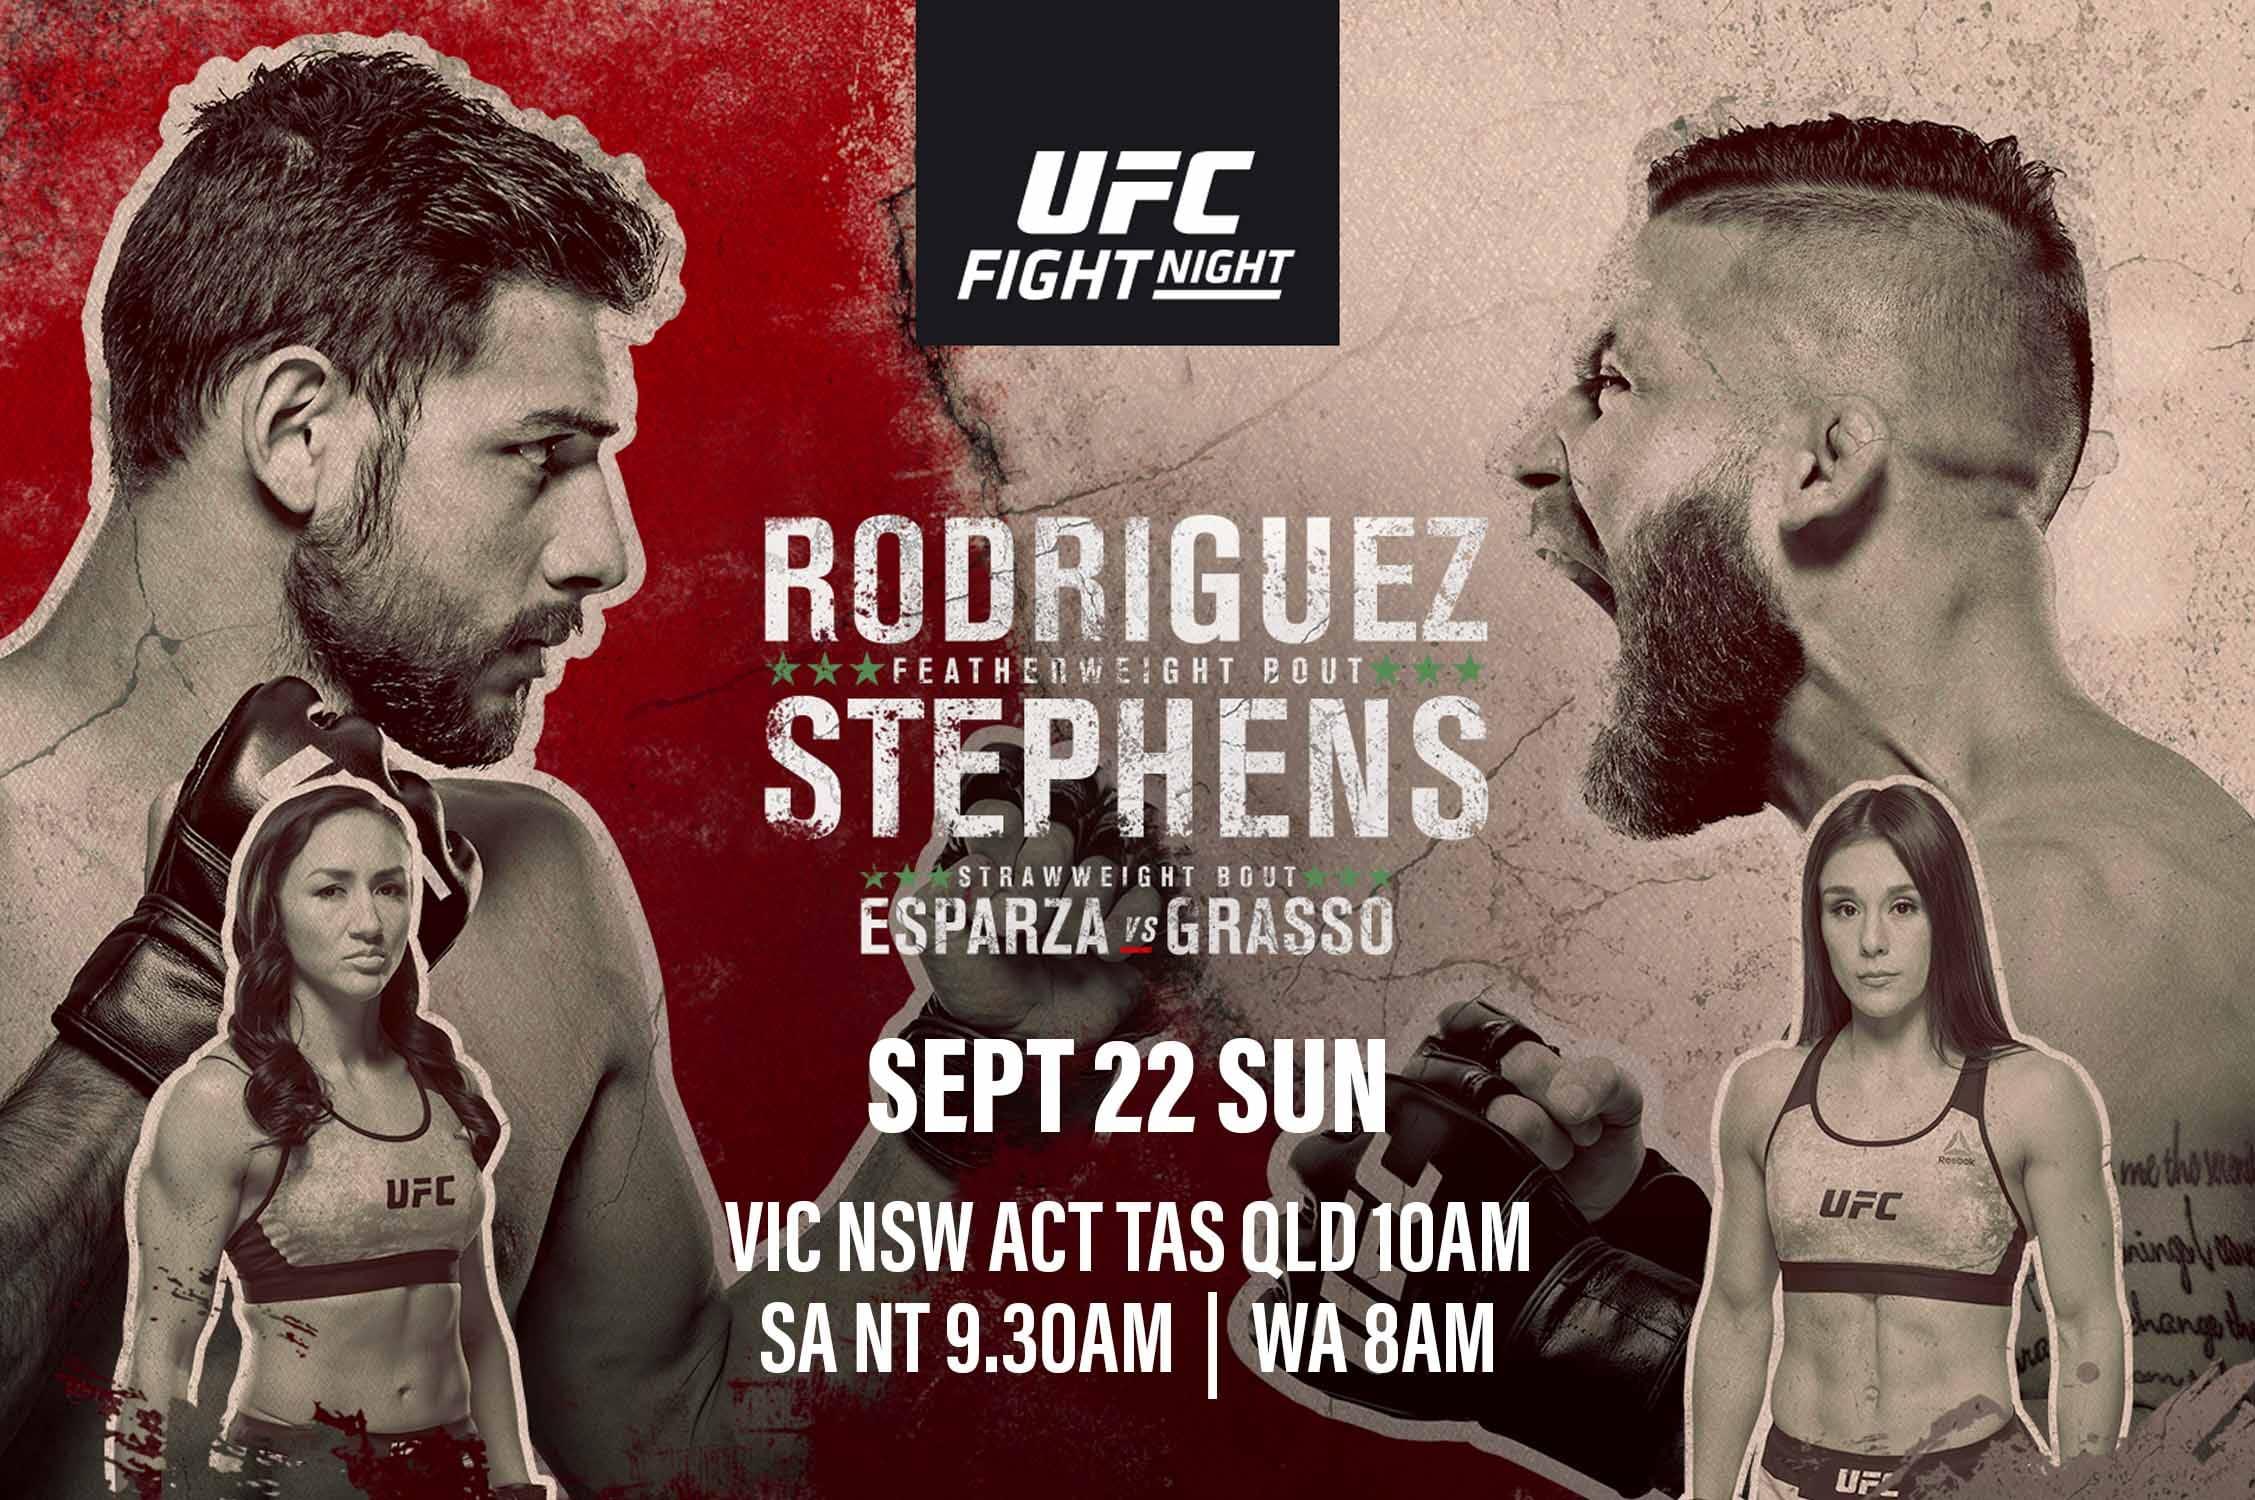 UFC Fight Night_Rodriguez vs Stephans_Sept 22_BATP-min.jpg